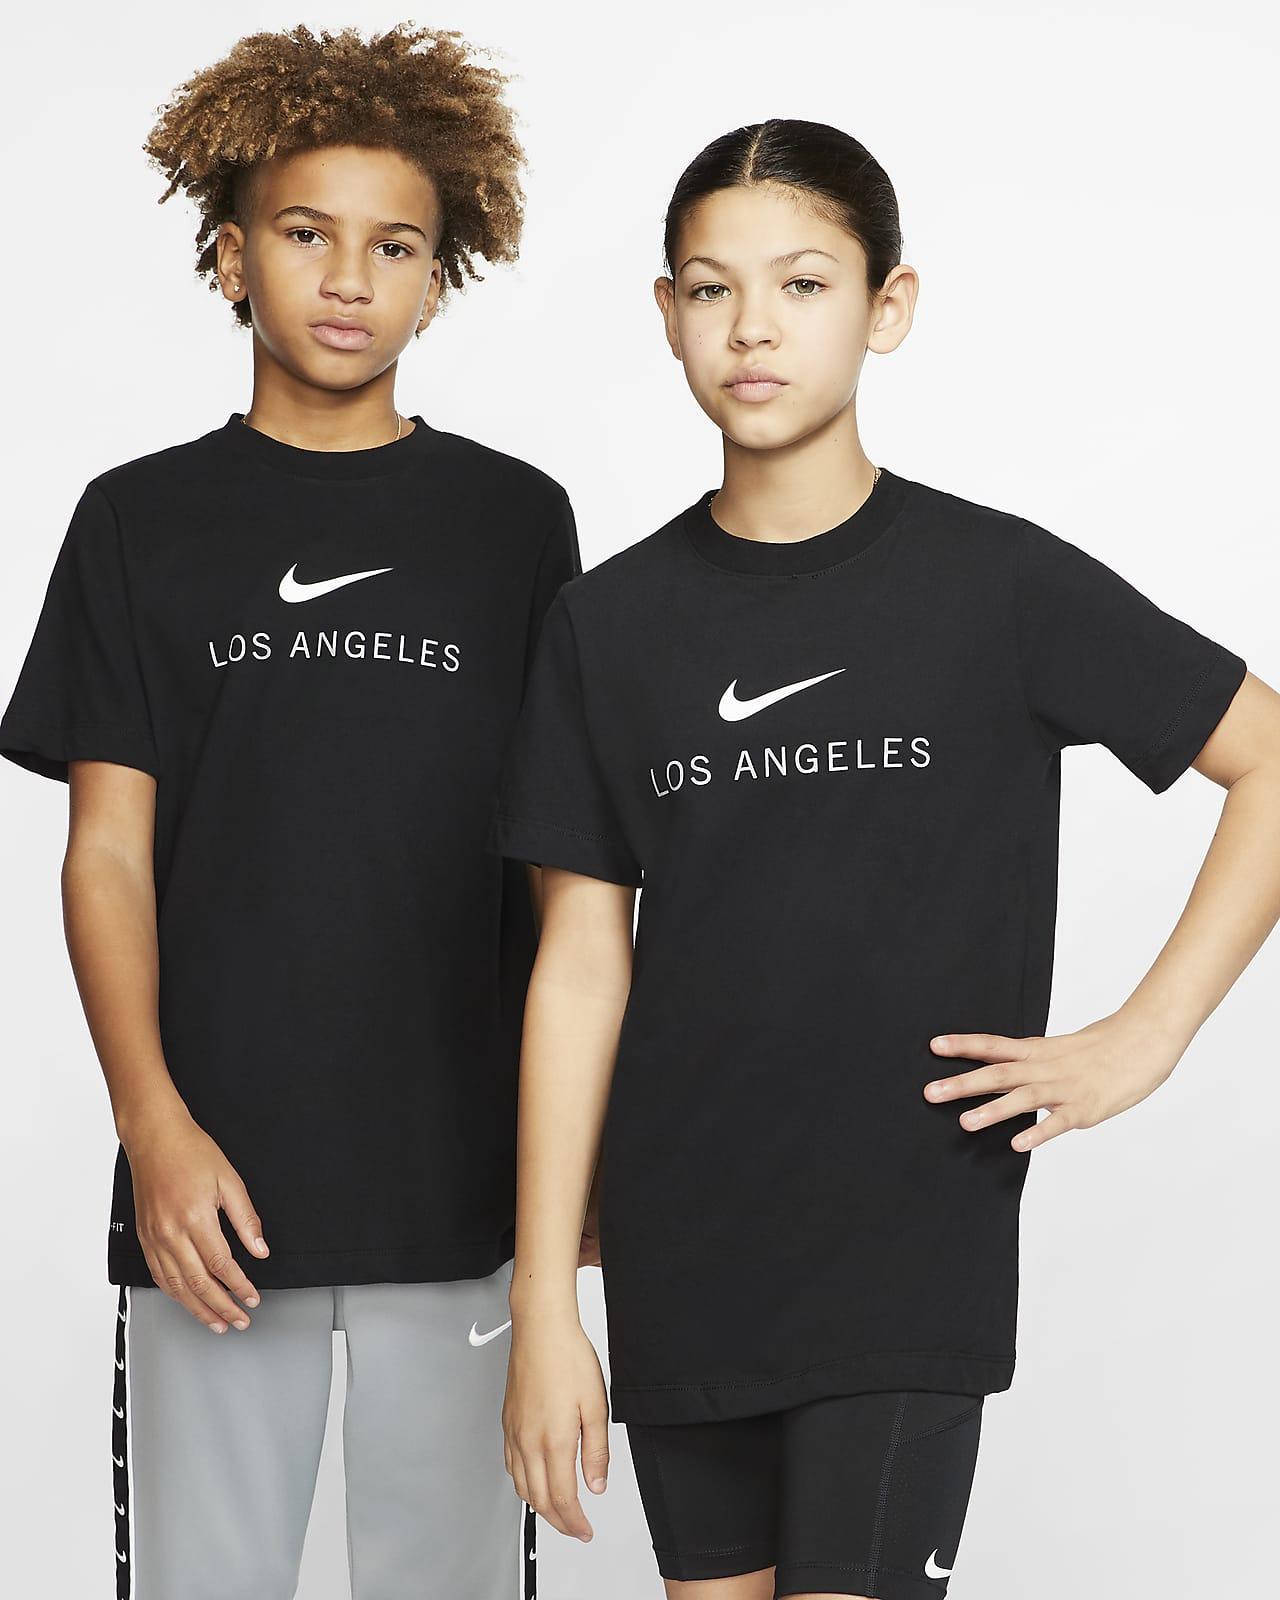 Playera para niños talla grande Nike Dri-FIT Los Angeles